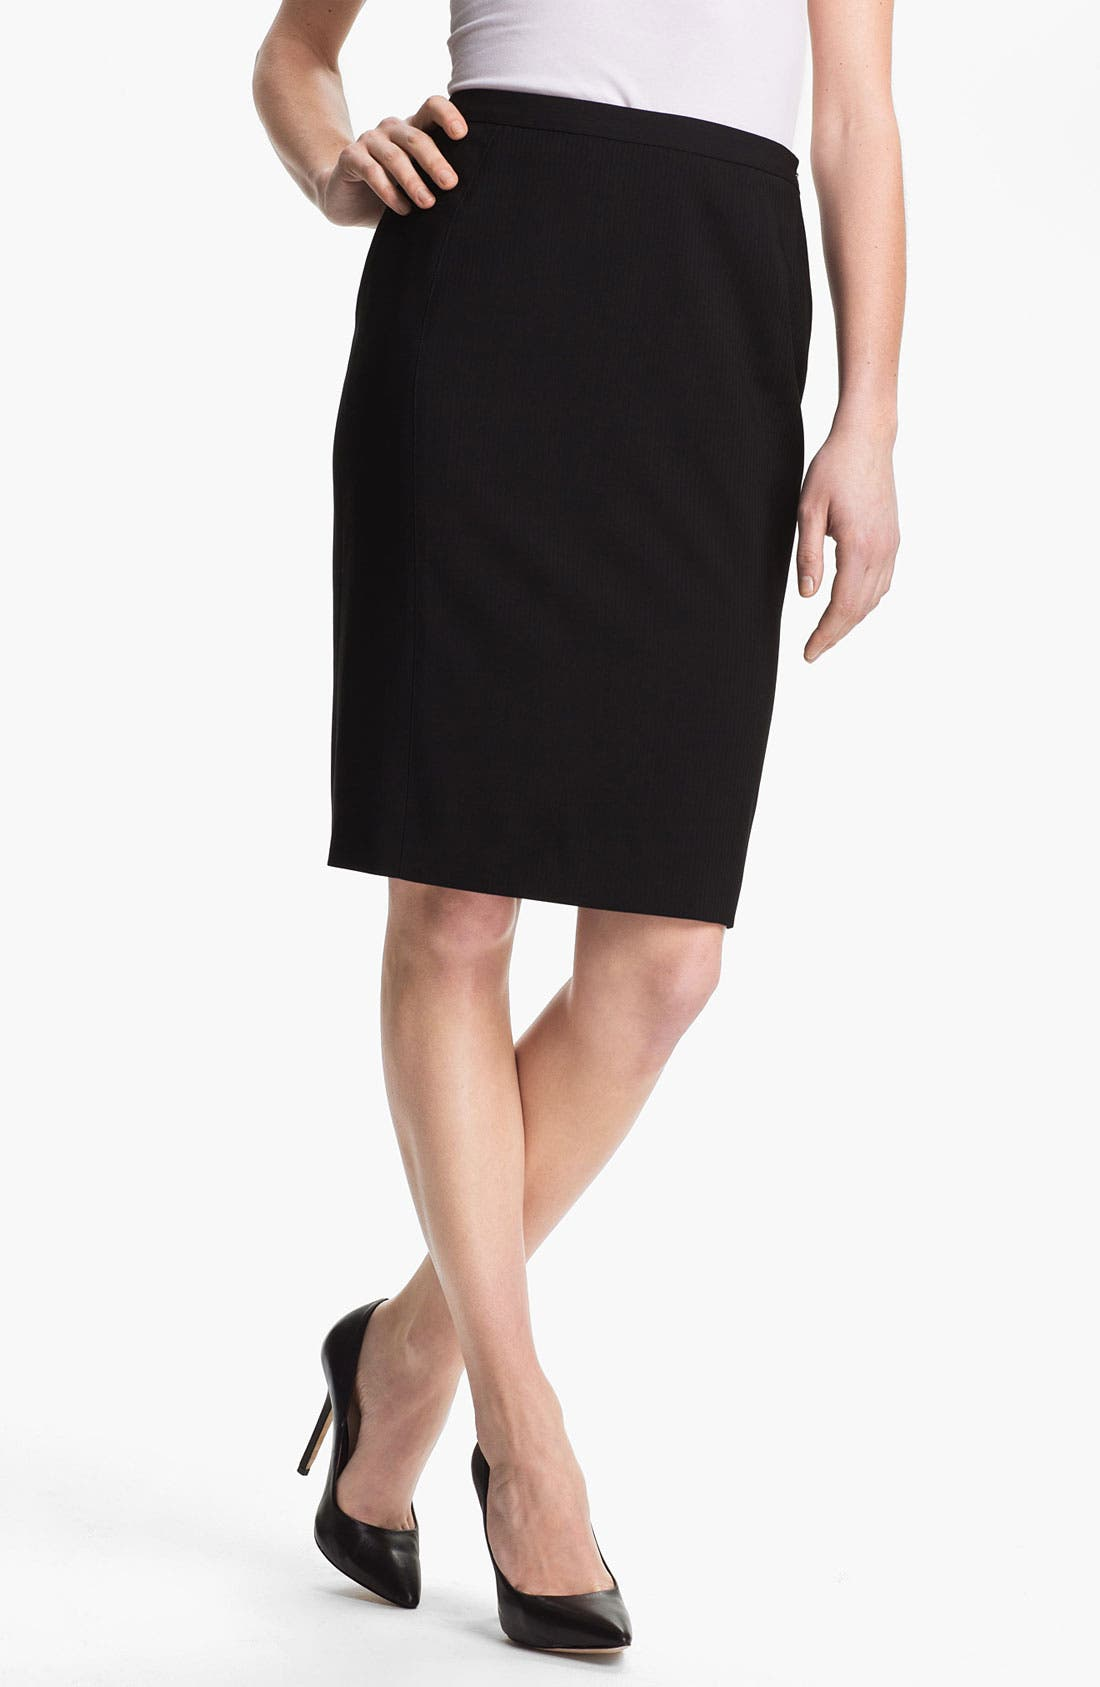 Alternate Image 1 Selected - Zanella 'Carol' Virgin Wool Skirt